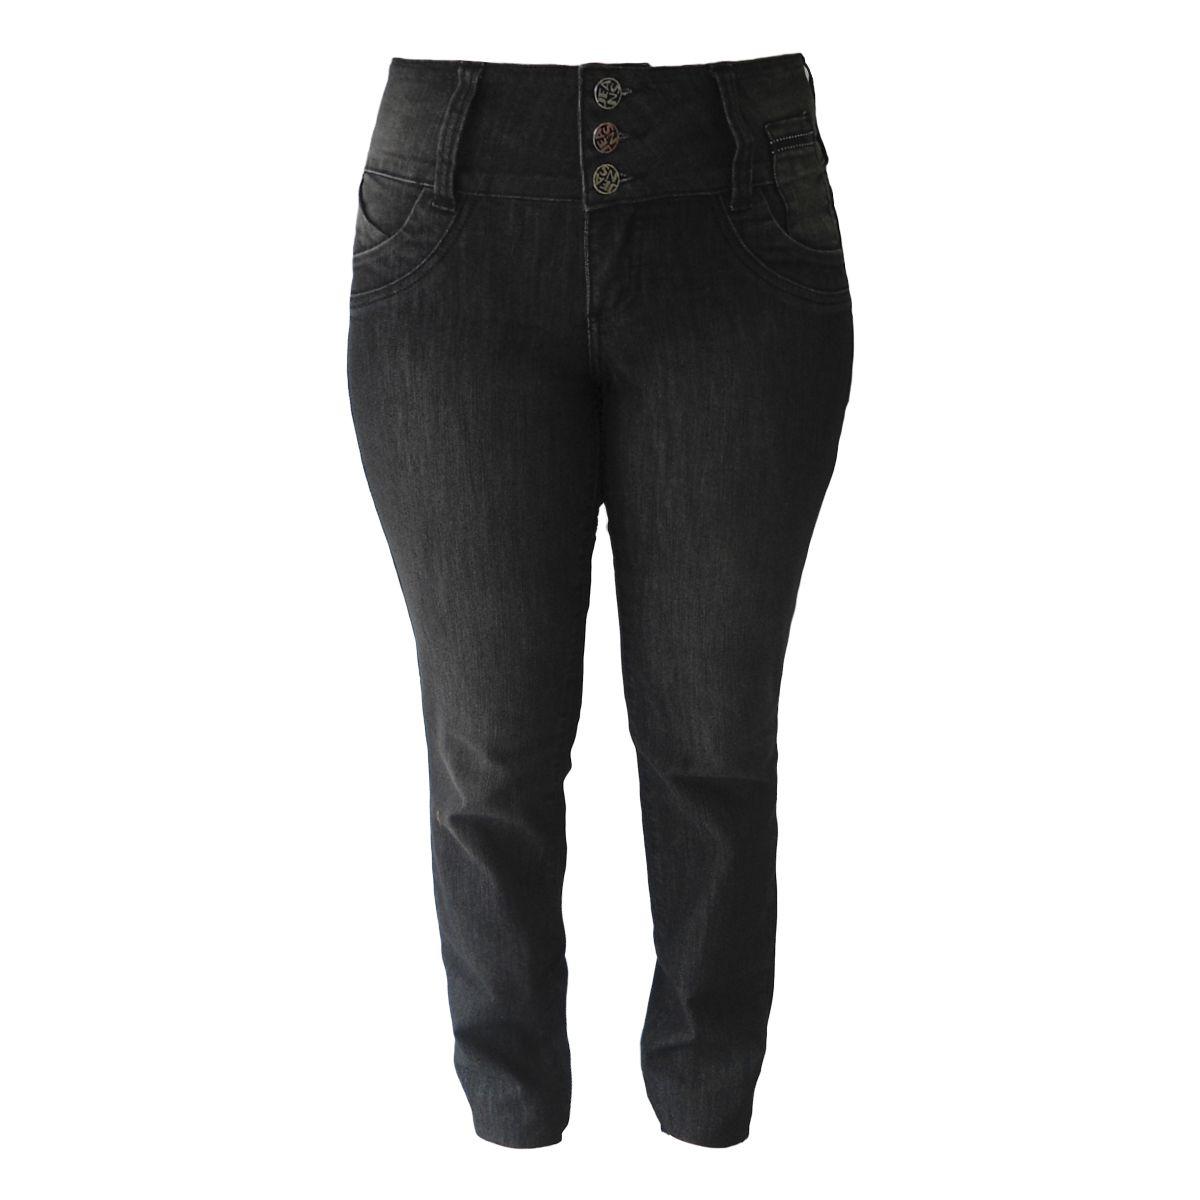 Calça Jeans Feminina Preta Plus Size Tamanho 42